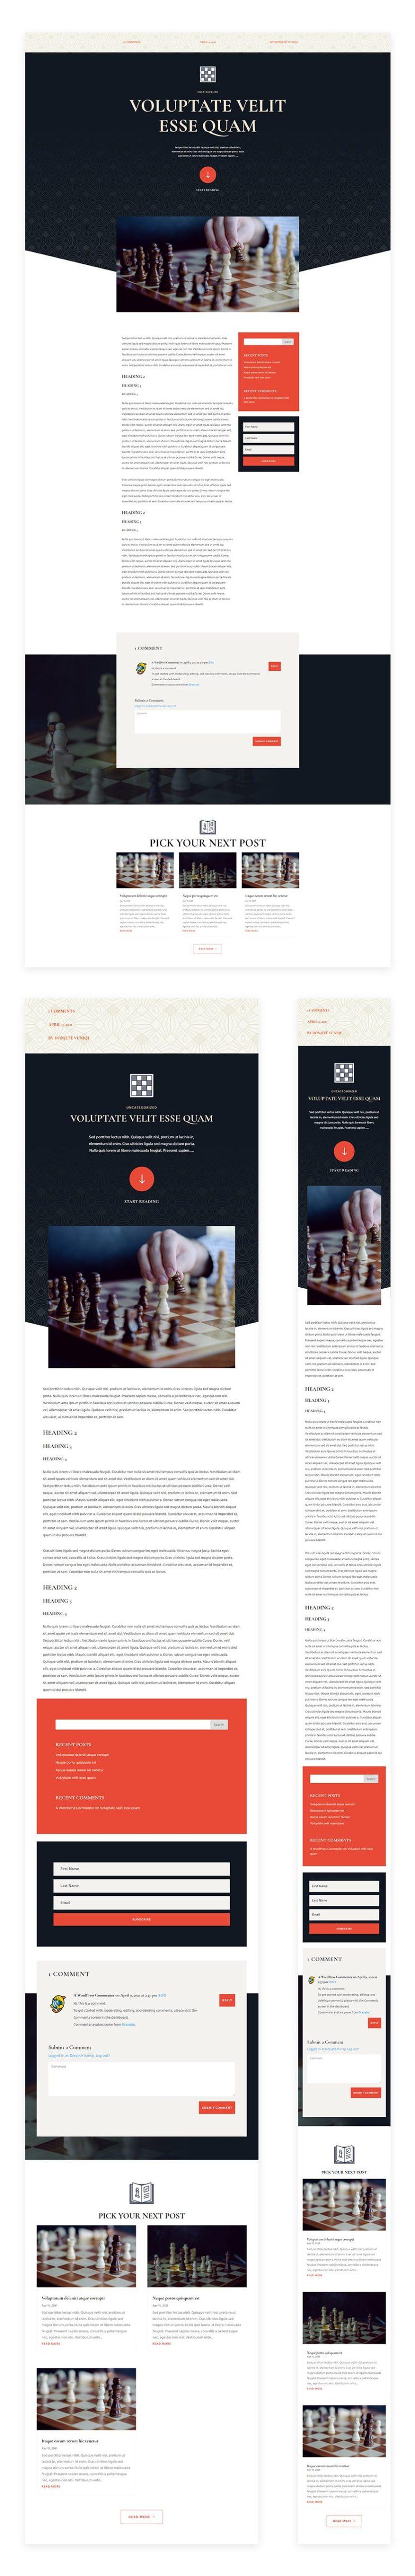 chess club blog post template